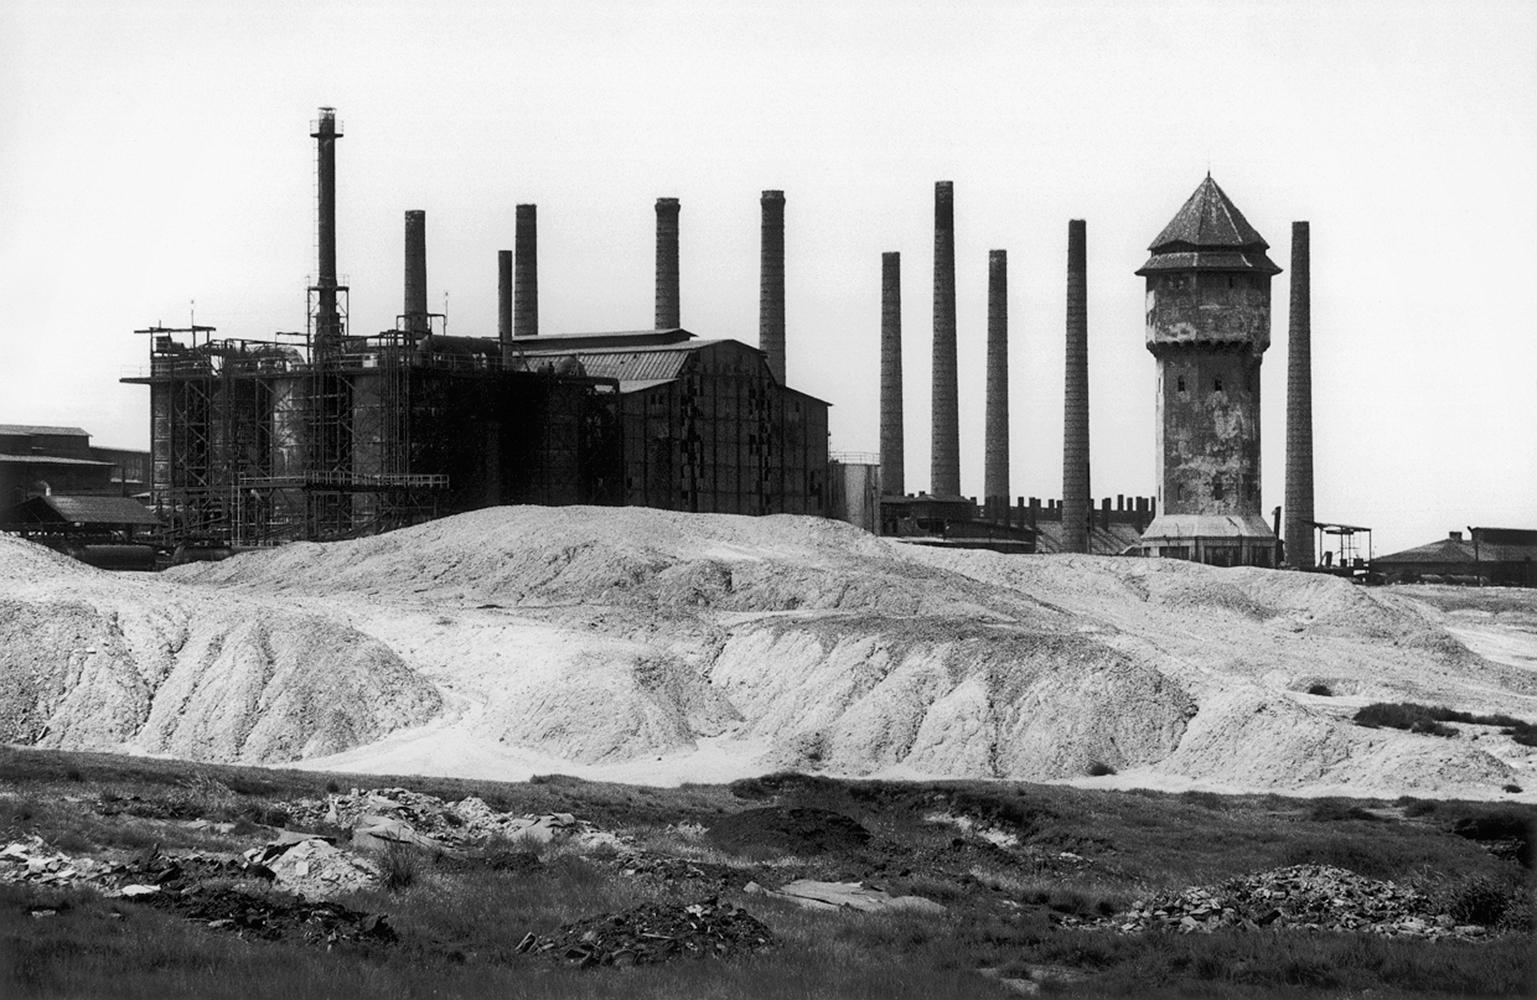 Michał Cała,  The Uthemann Zinc Smelter,  1978